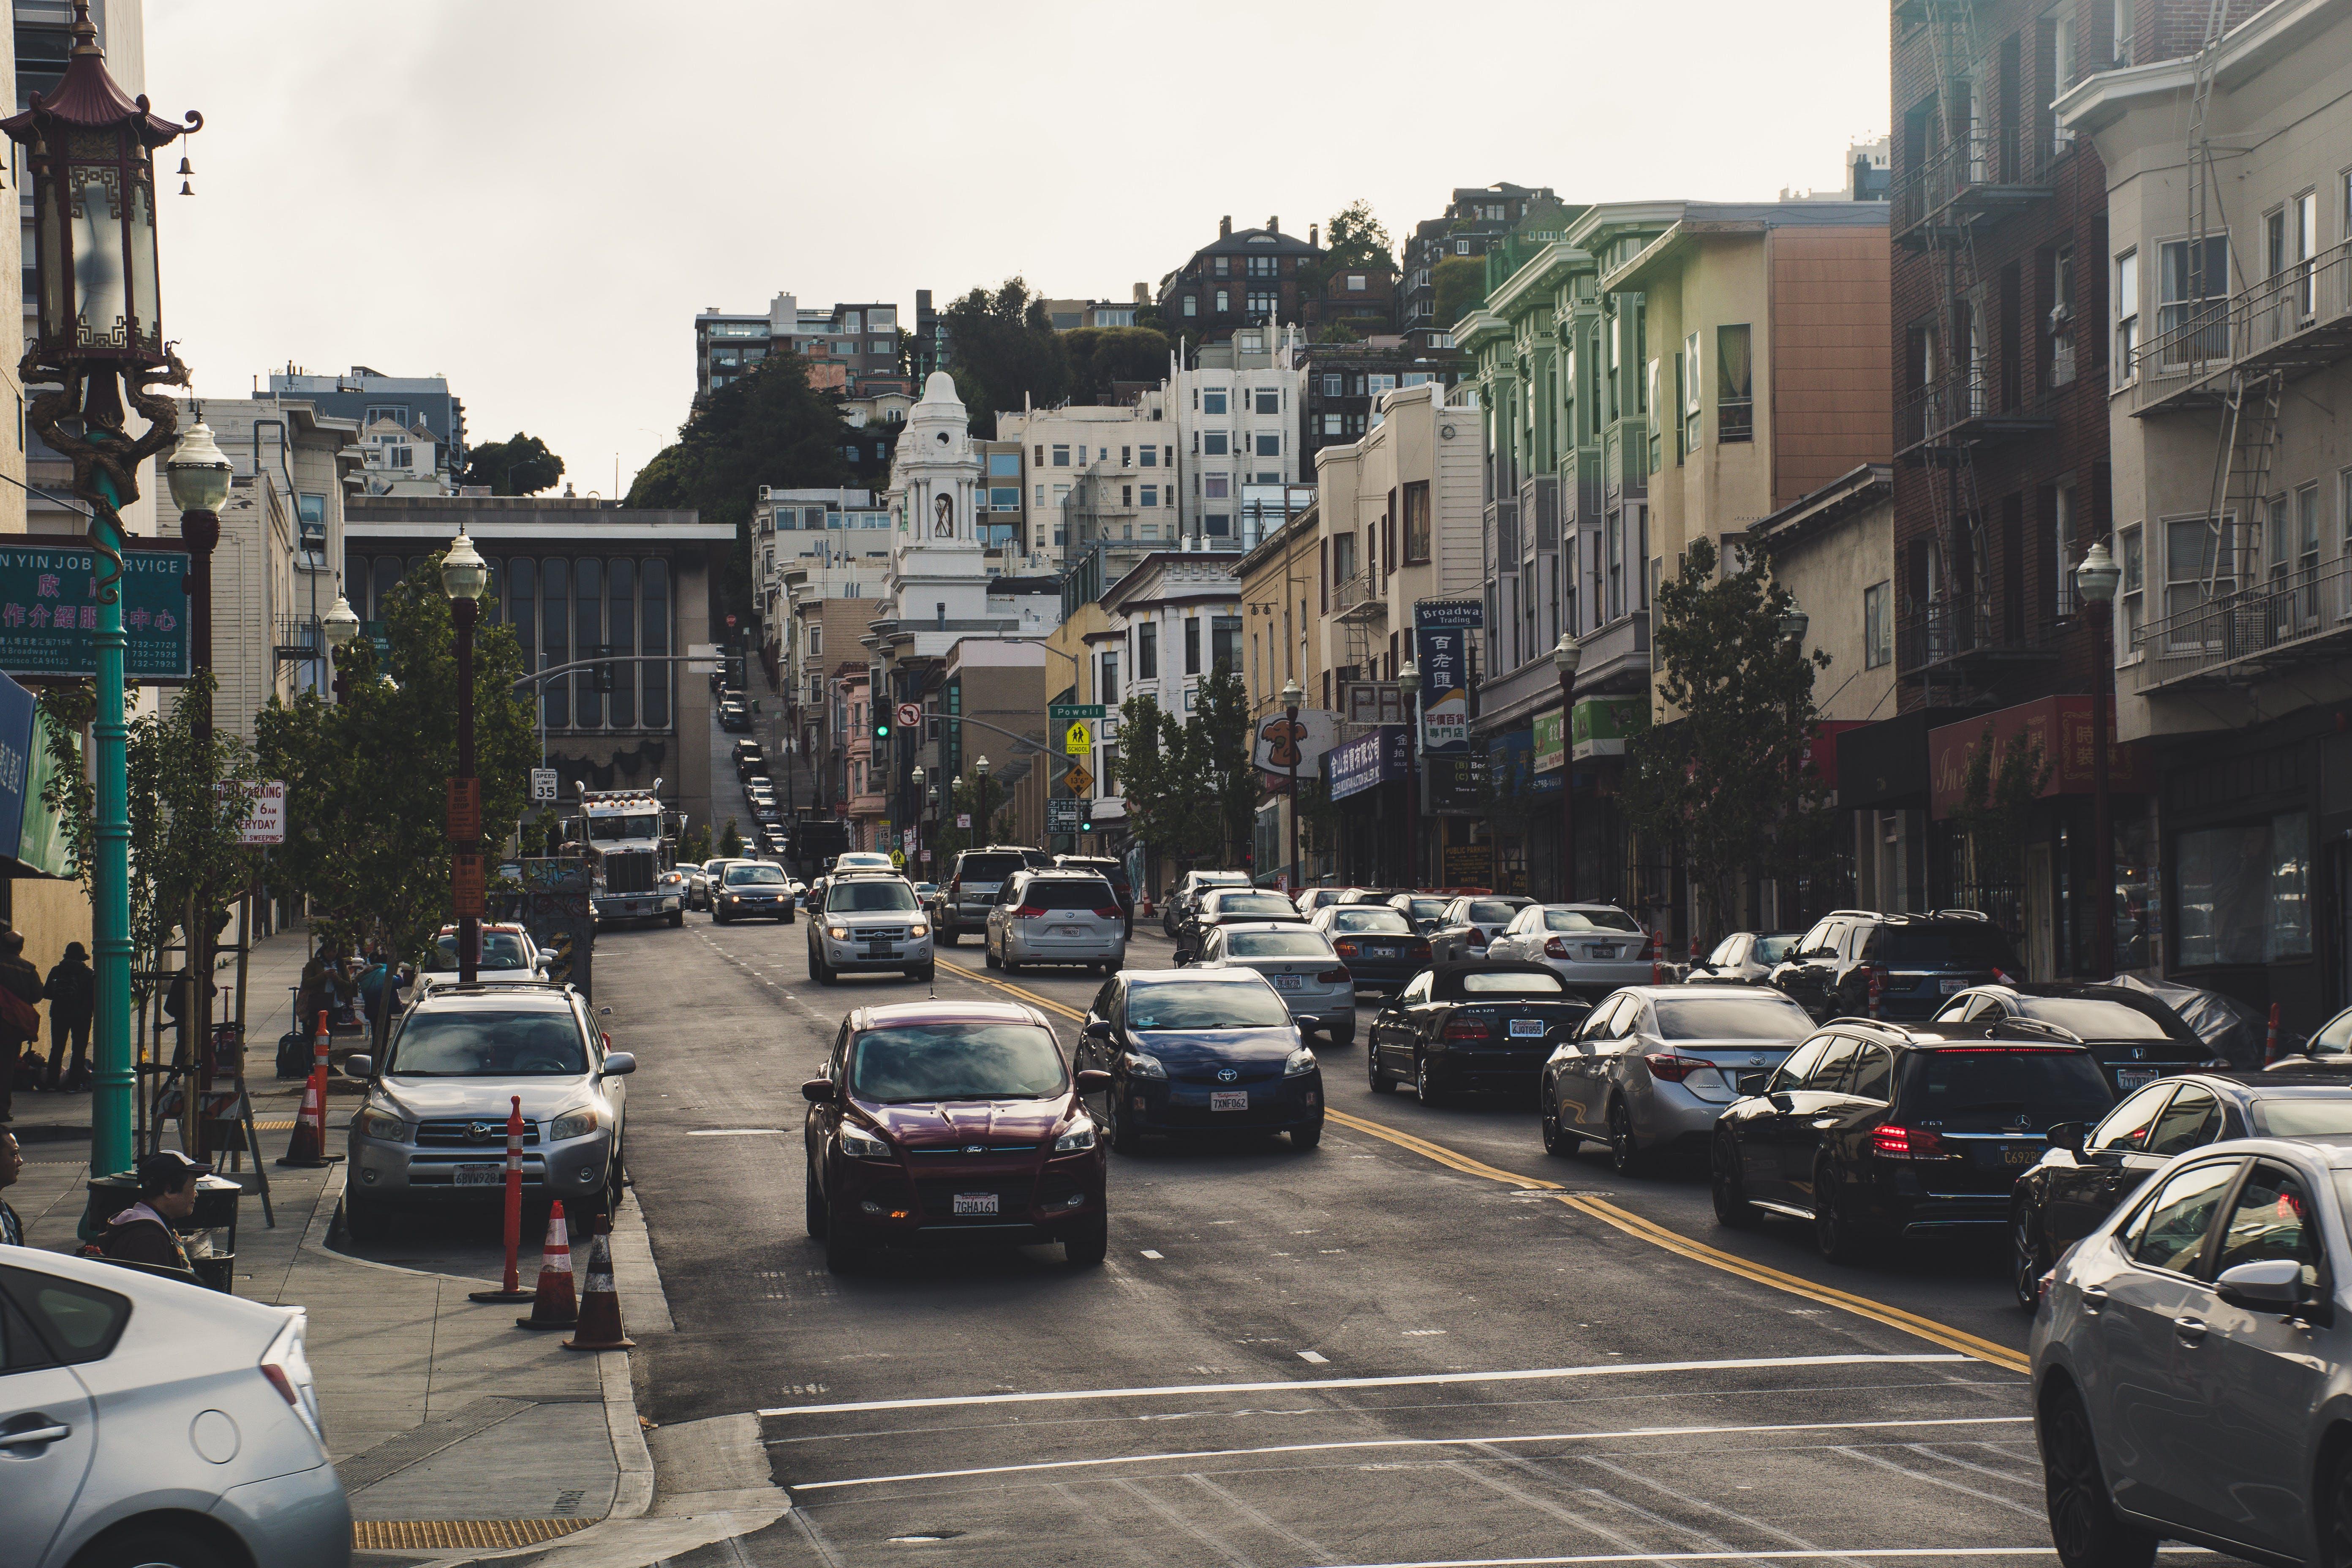 Gratis stockfoto met architectuur, auto's, binnenstad, commercie